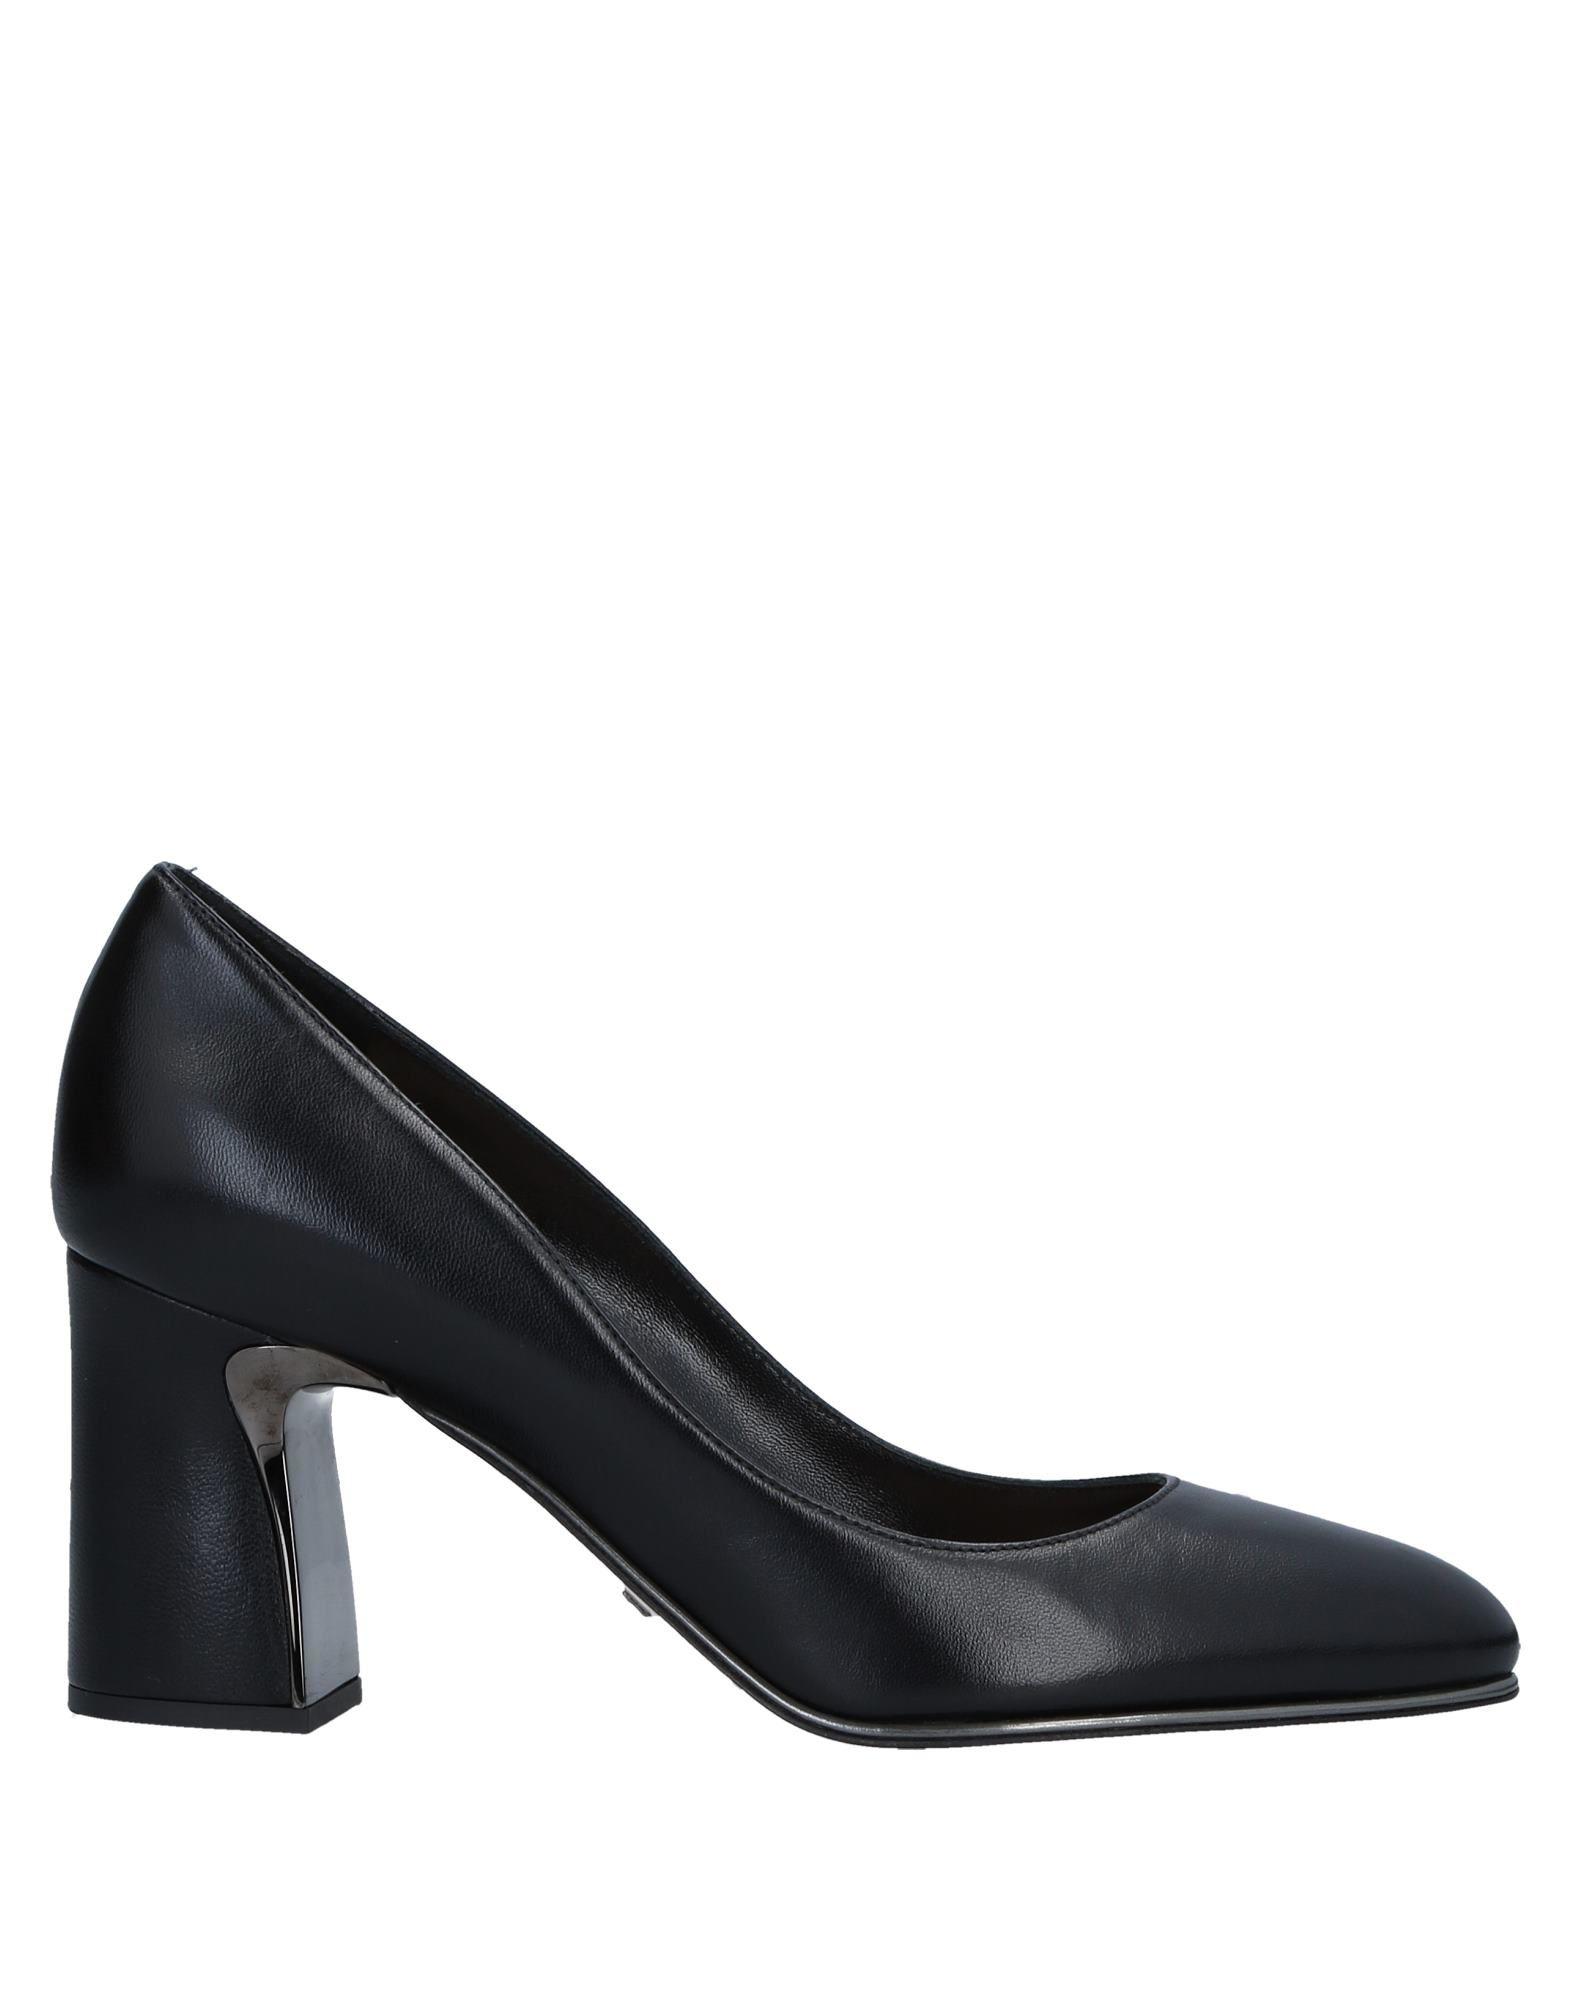 Sebastian Pumps Damen  11536452DTGut aussehende strapazierfähige Schuhe